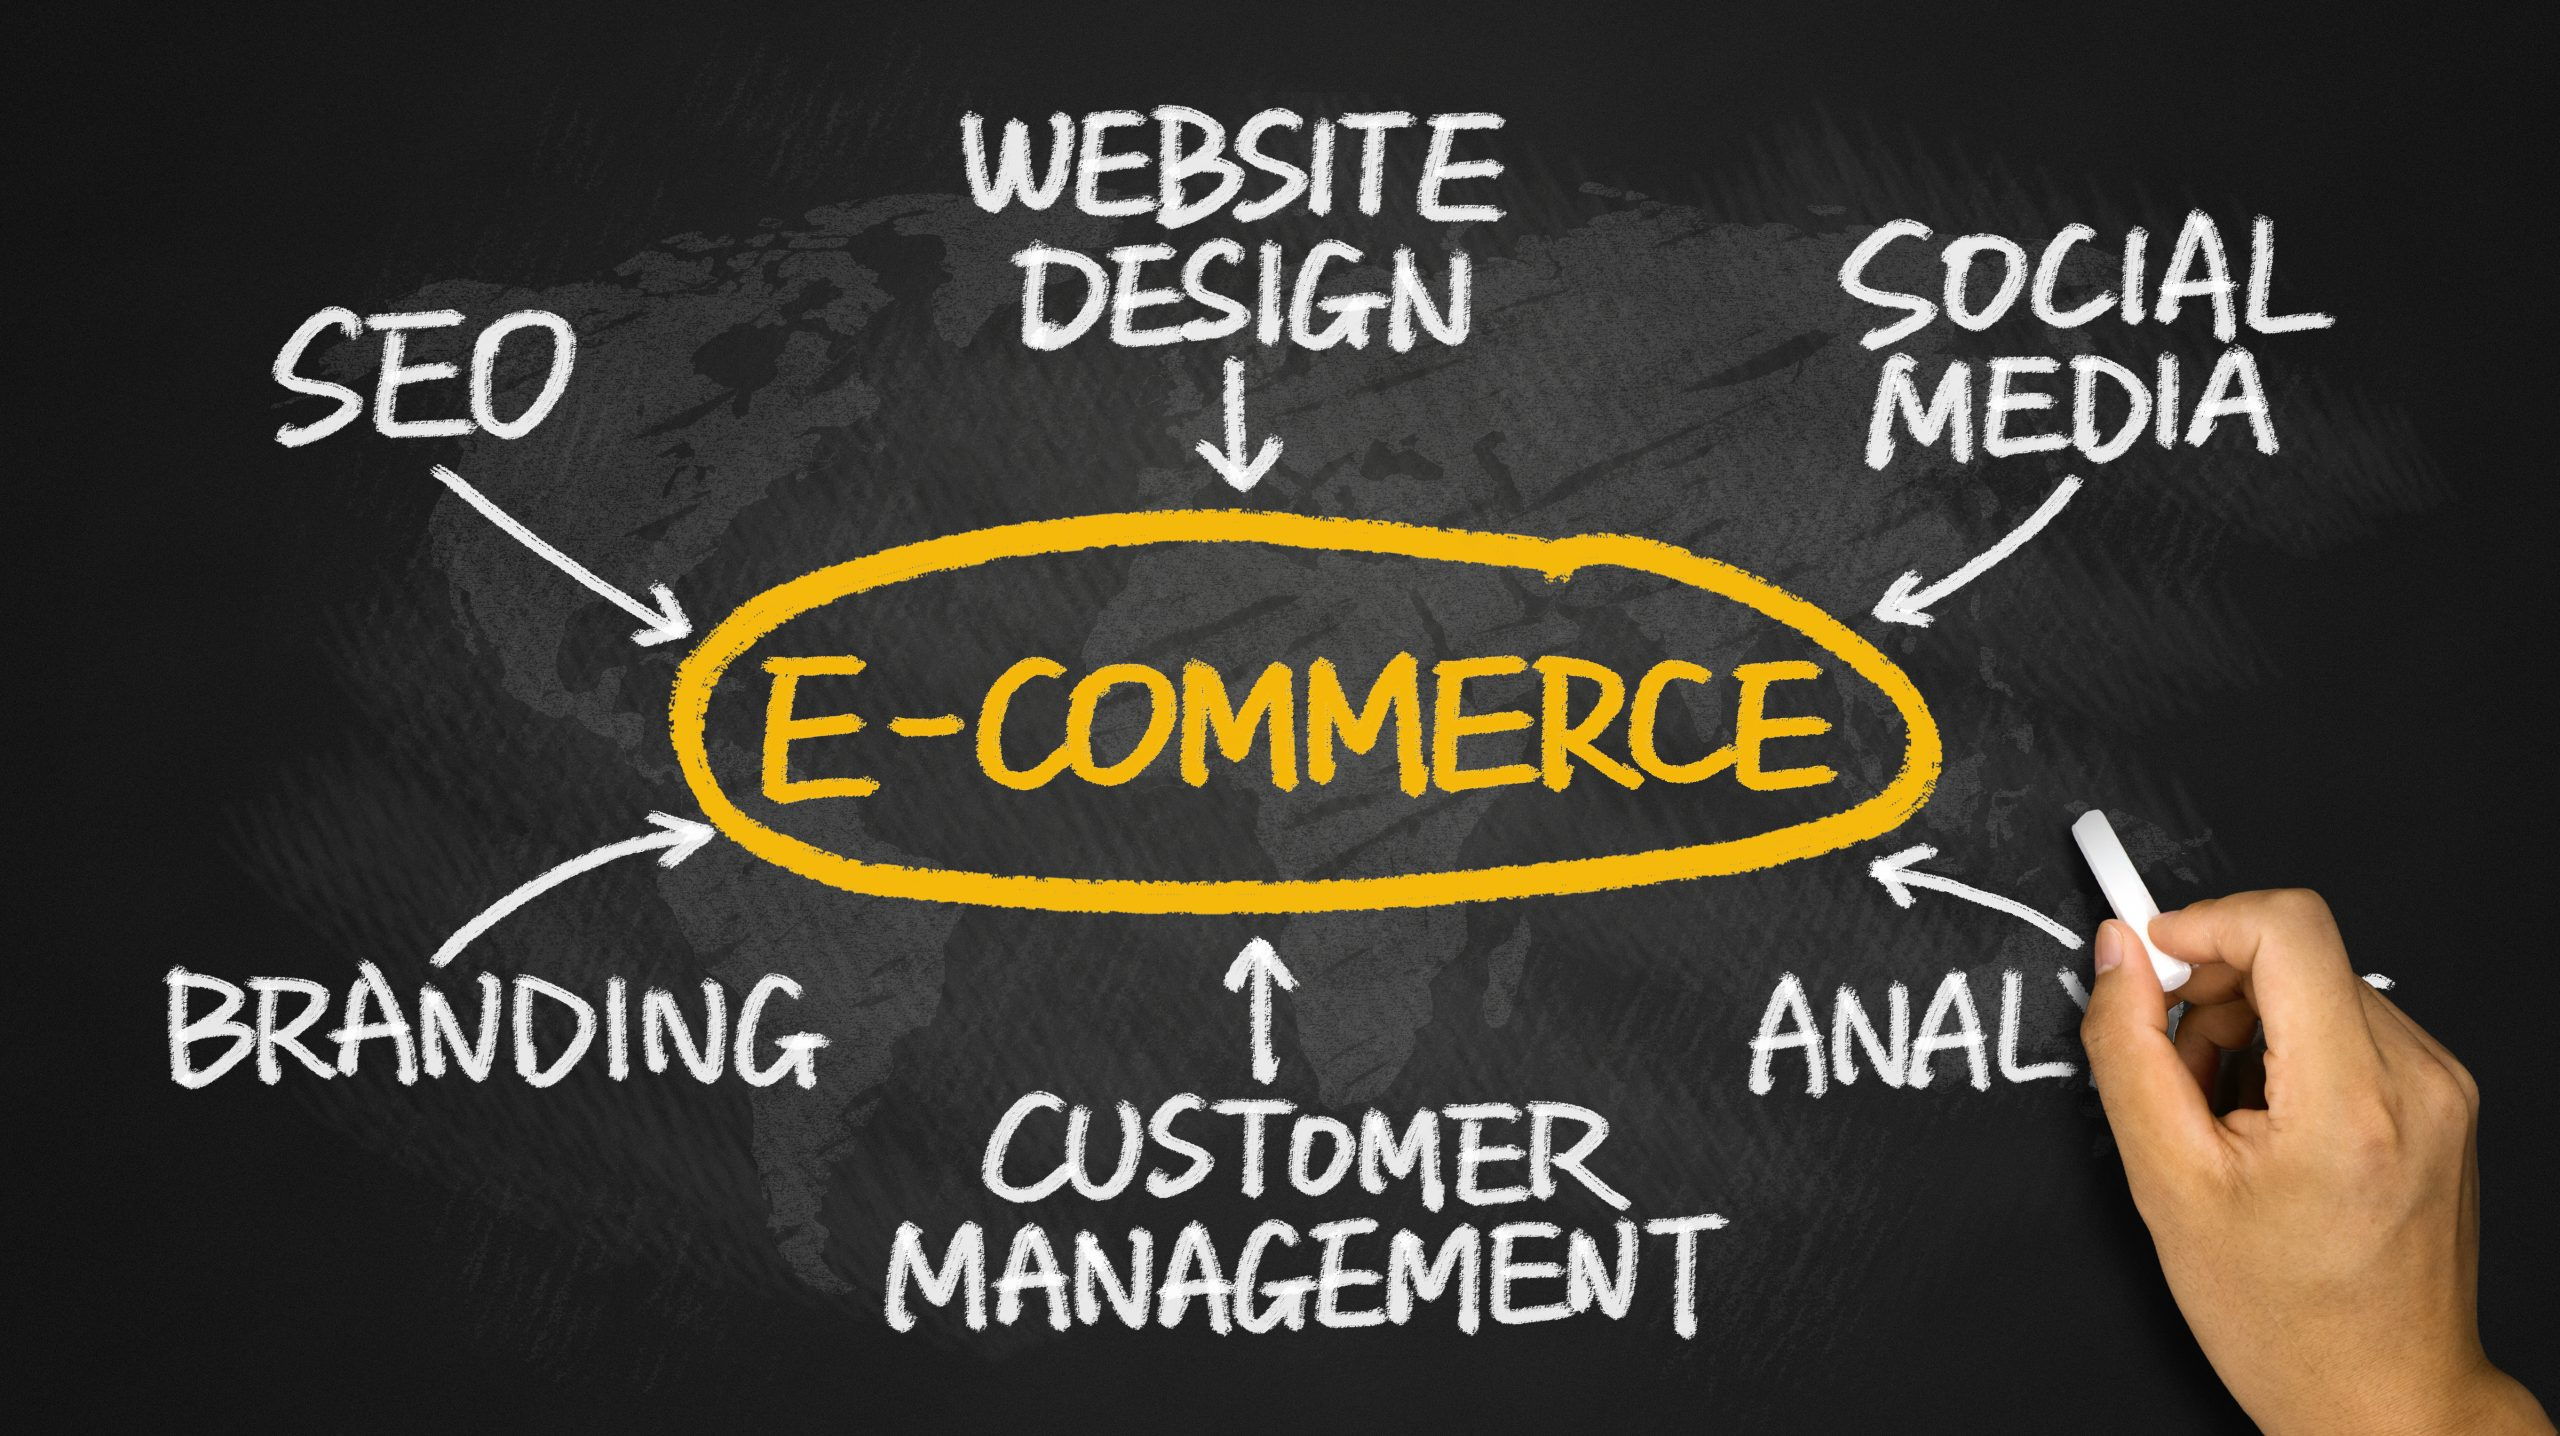 Why choose us for e-commerce web development